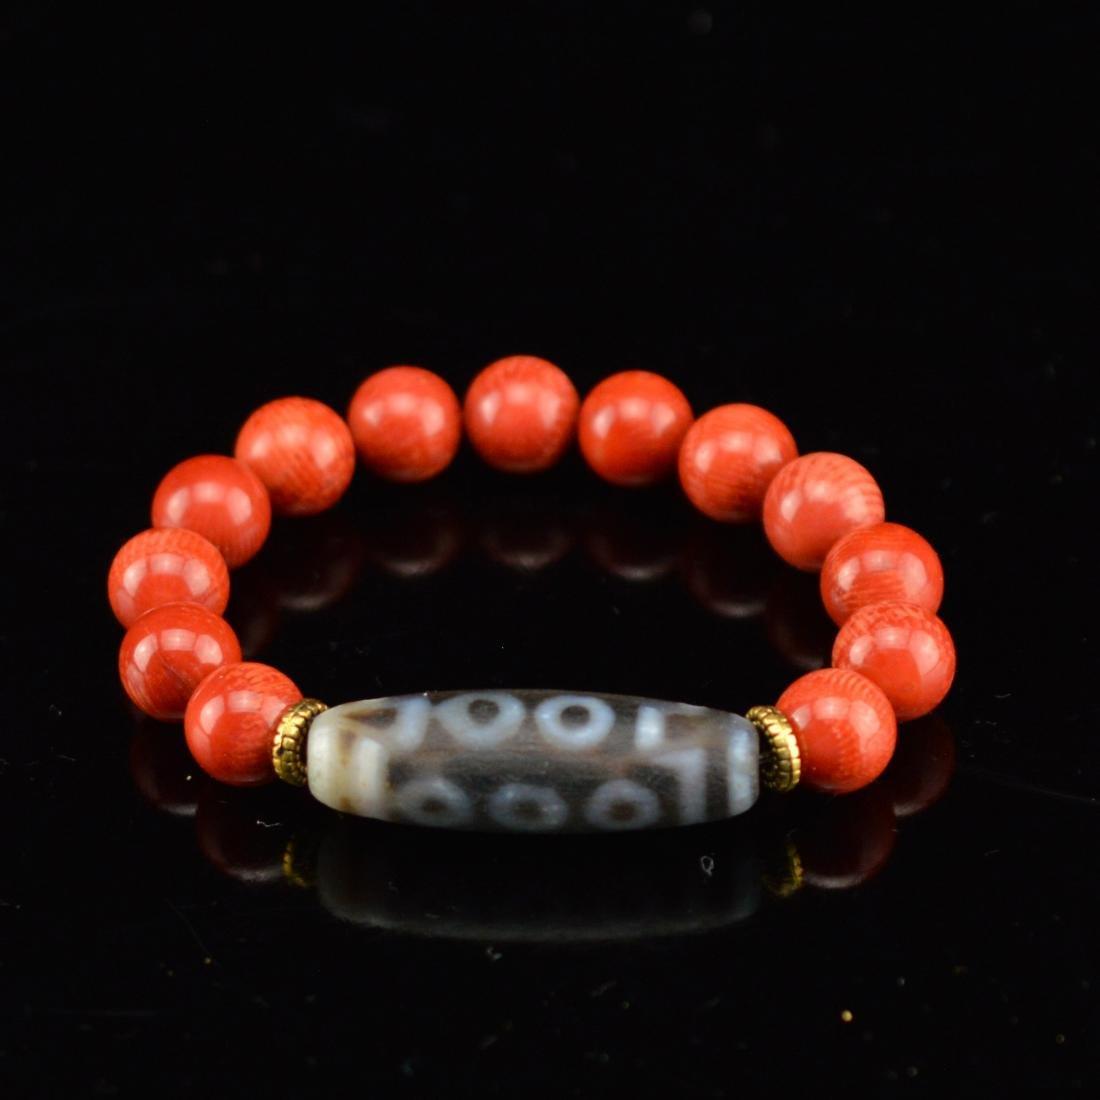 Red coral with ten eyes DZI bracelet